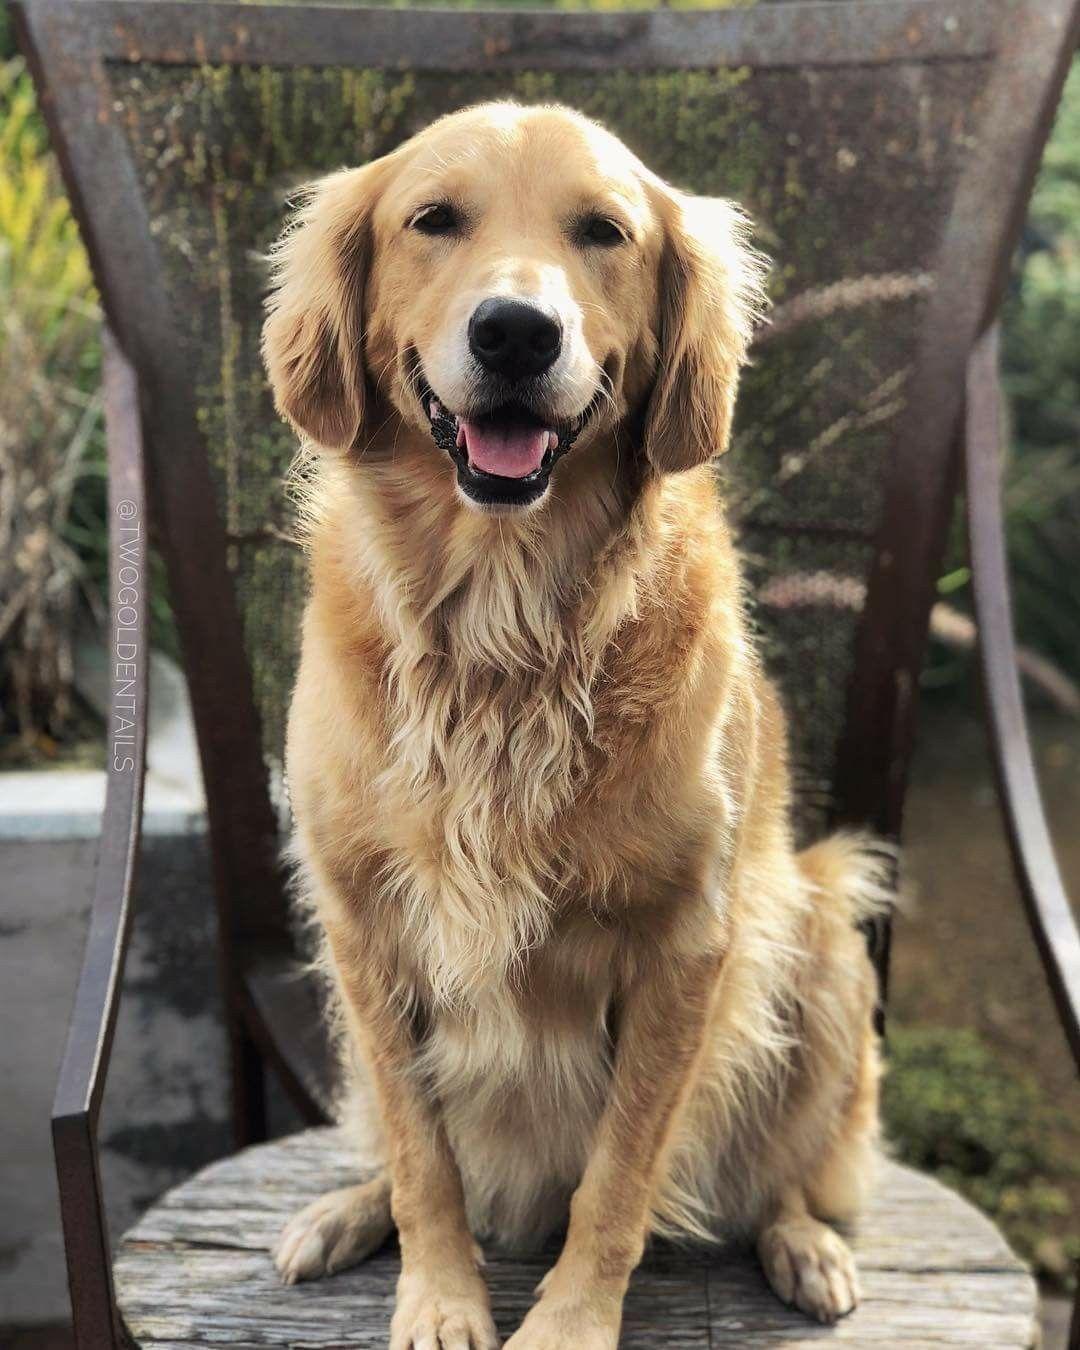 He Looks Like Our Dog Golden Retriever Dogs Golden Retriever